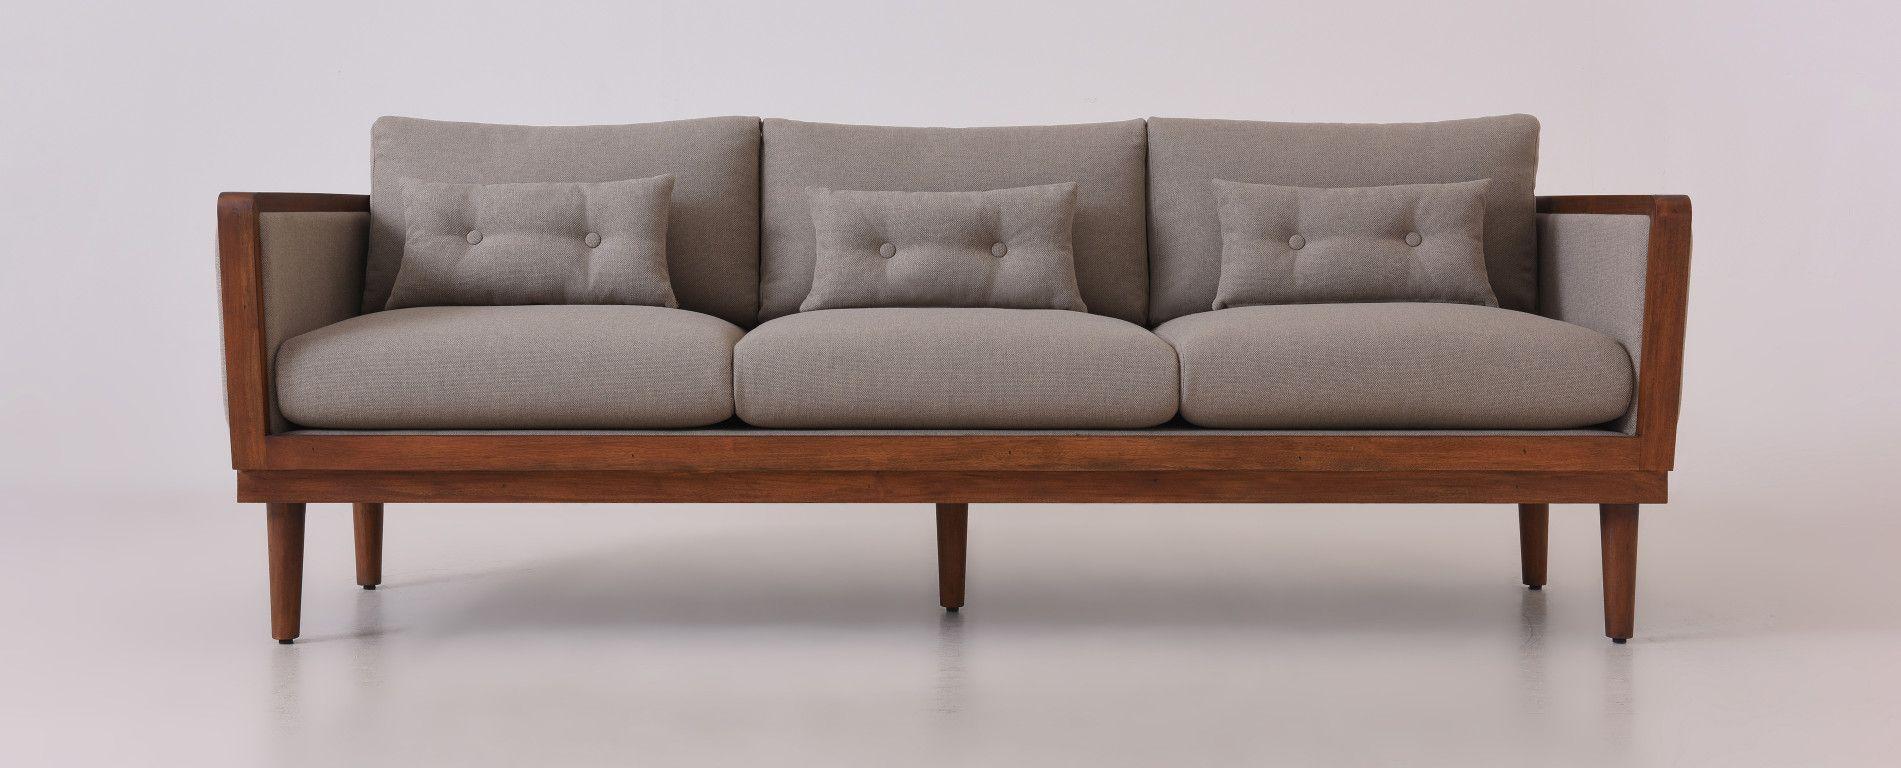 Bosley Sofa W Wrap Around Frame Wooden Sixpenny